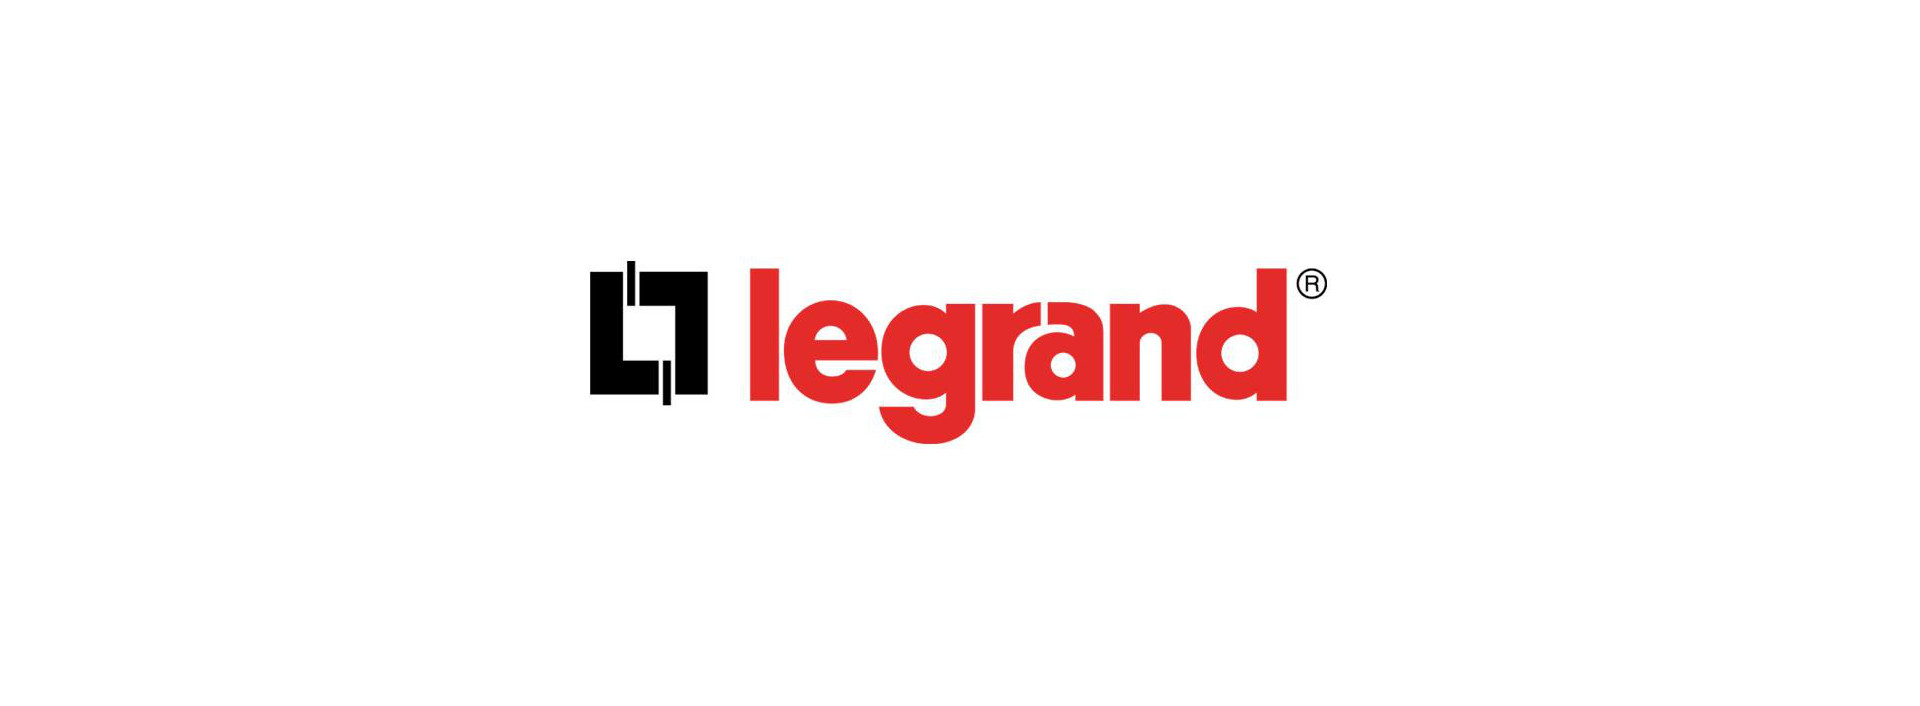 - Tableau pré-câblé LEGRAND